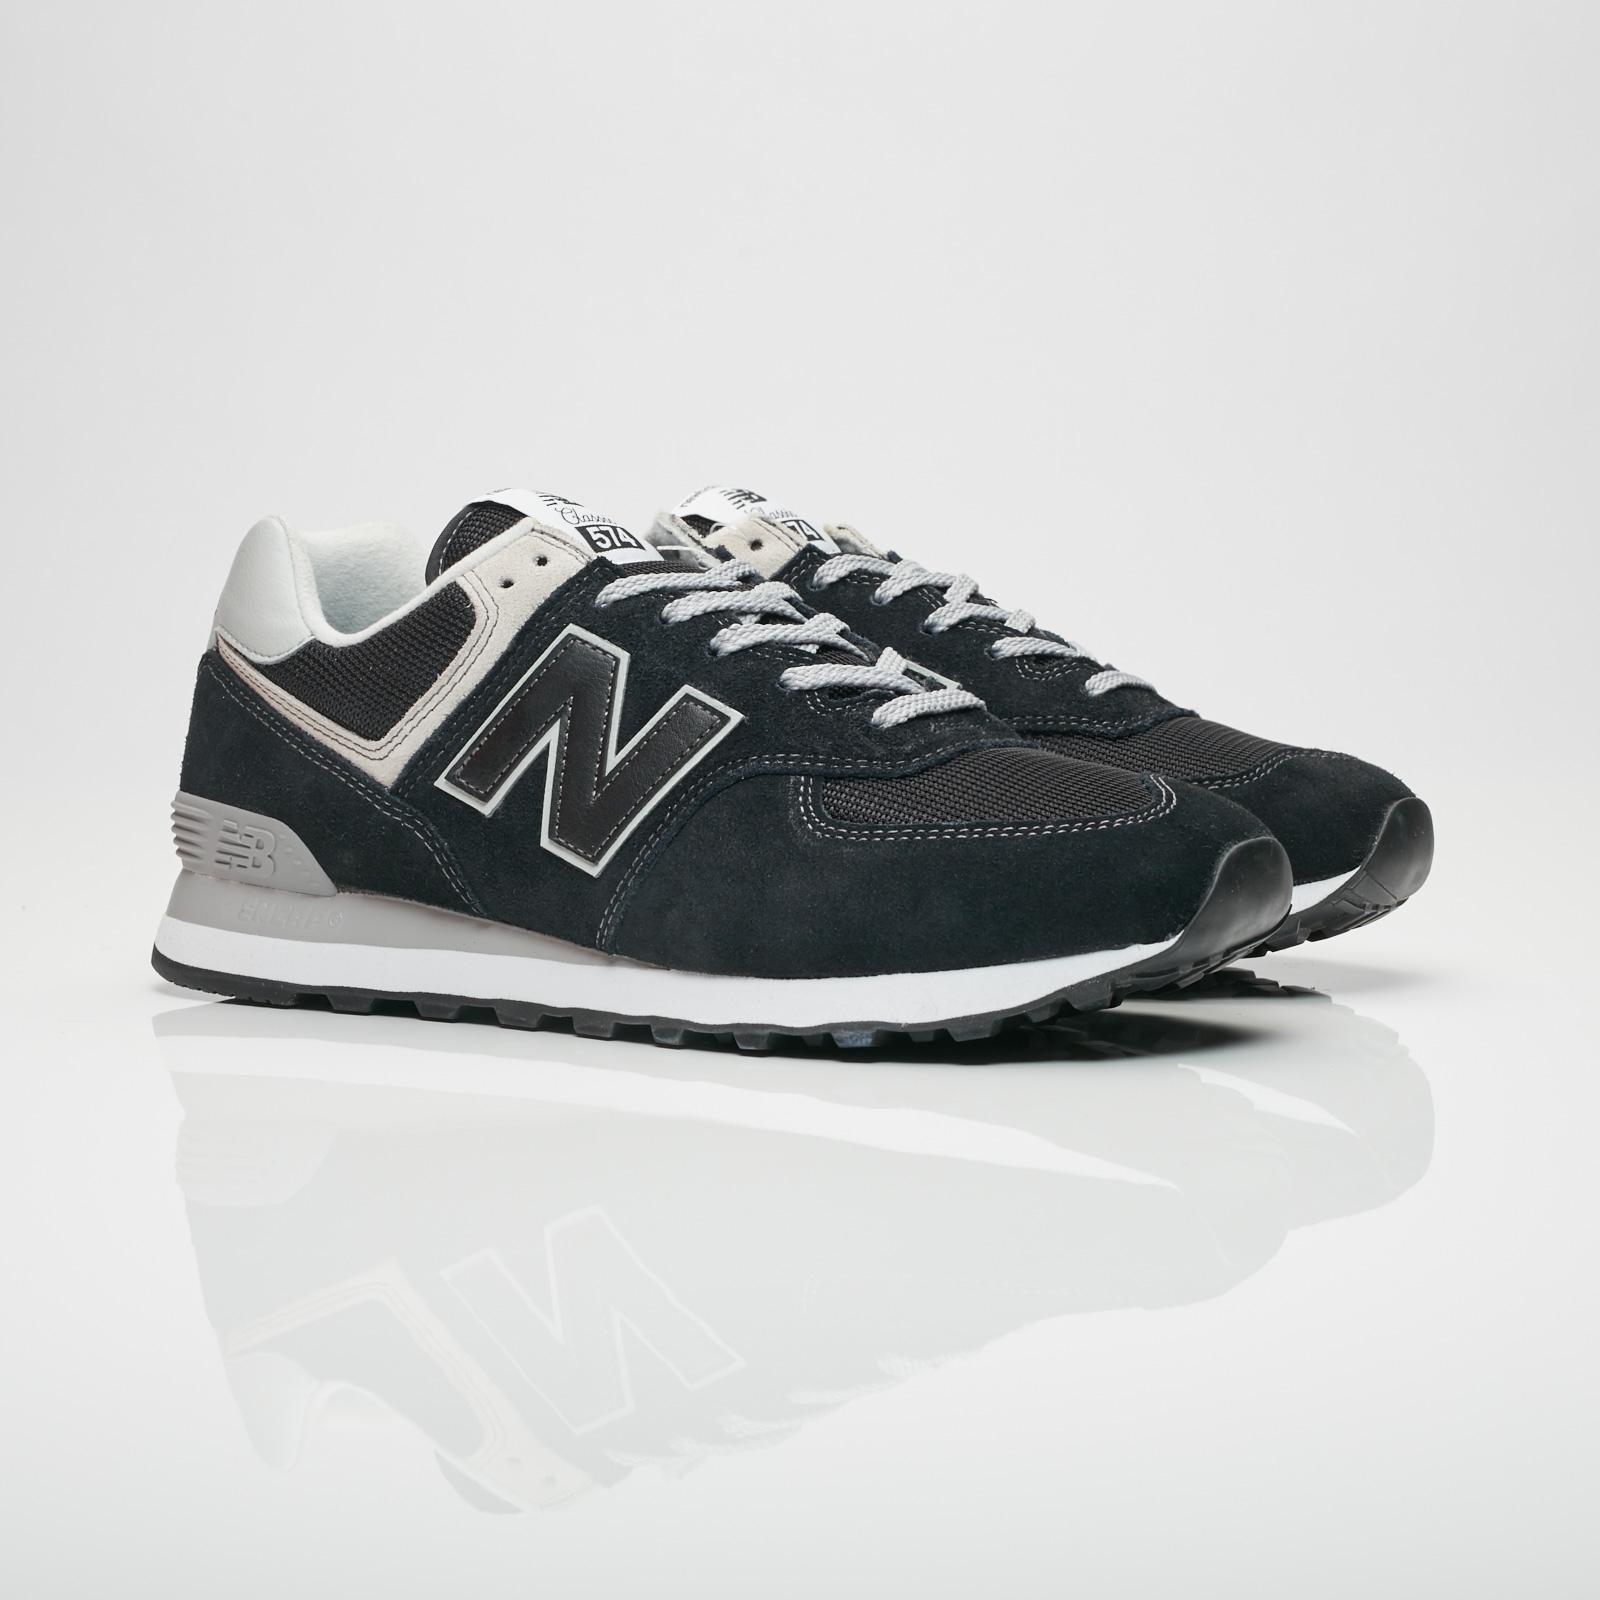 official photos b65bb 76085 New Balance ML574EGK - Ml574egk - Sneakersnstuff   sneakers ...